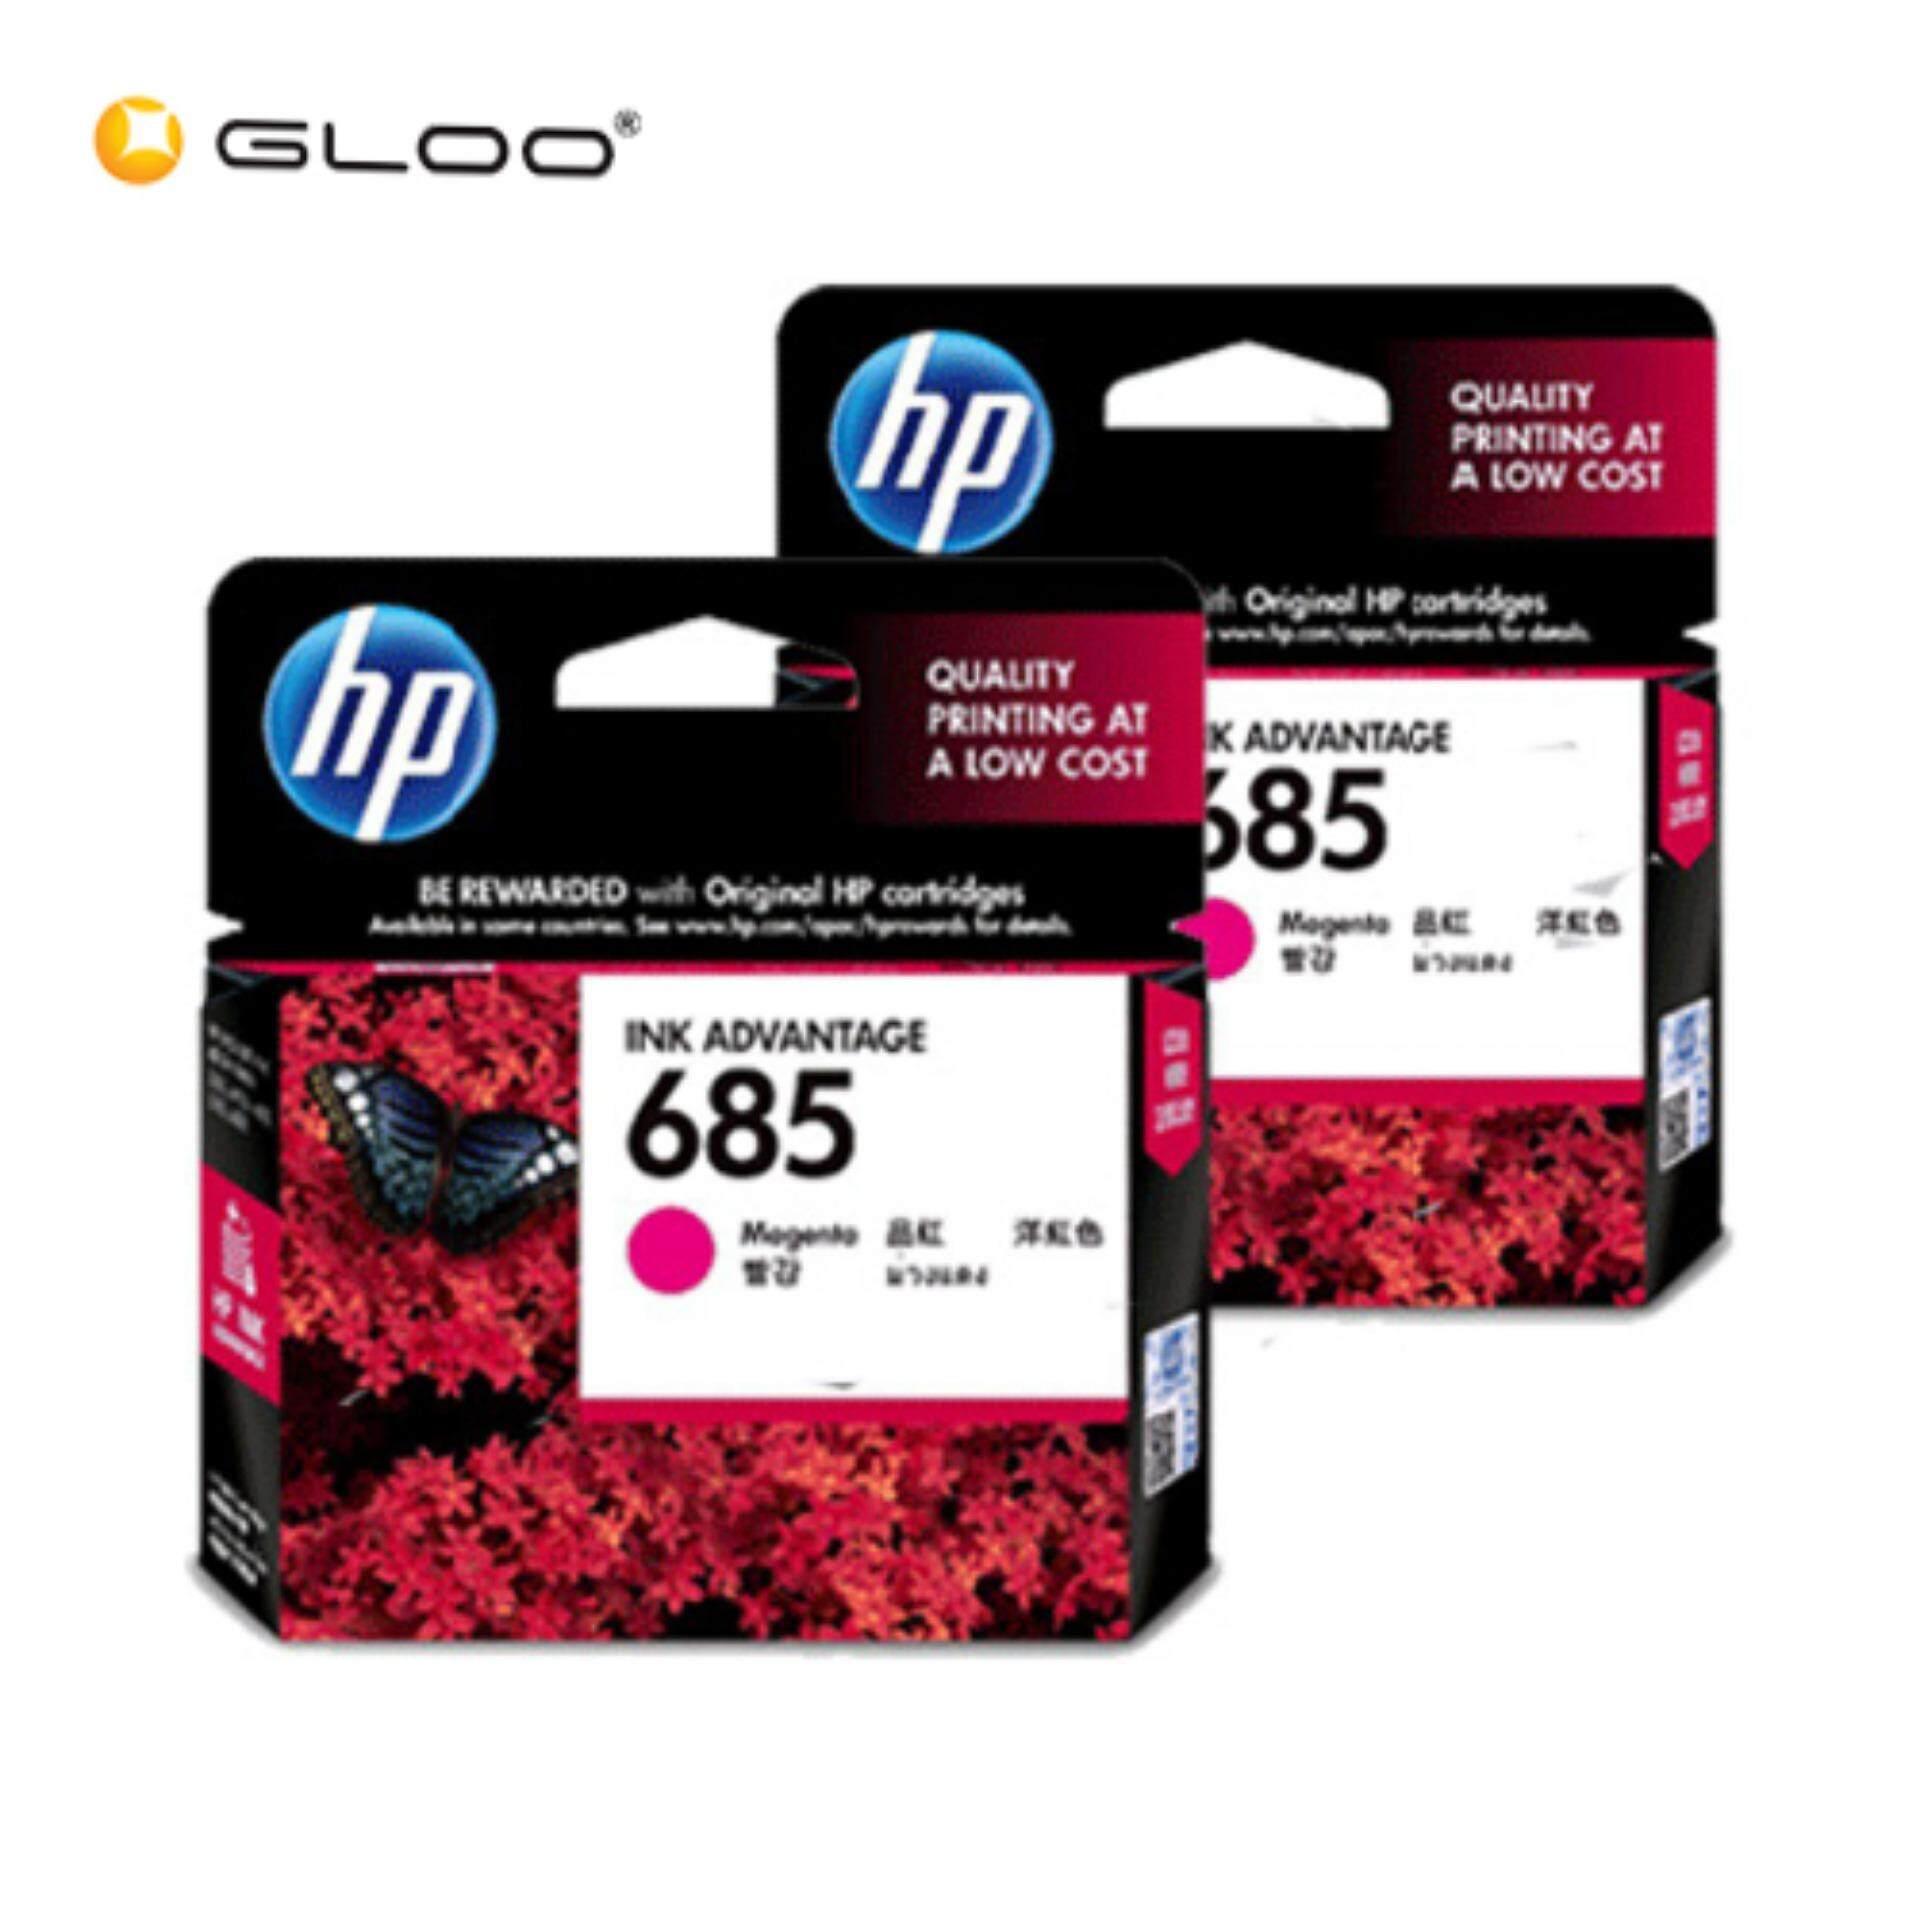 [2 Units] HP 685 Magenta Original Ink Advantage Cartridge CZ123AA